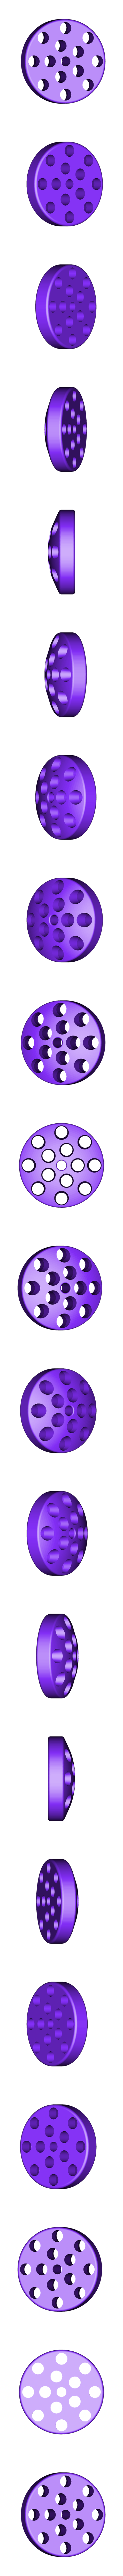 R8 Collet Top Through Center.stl Download STL file R8 Collet Spinning Holder • Design to 3D print, GForceFX